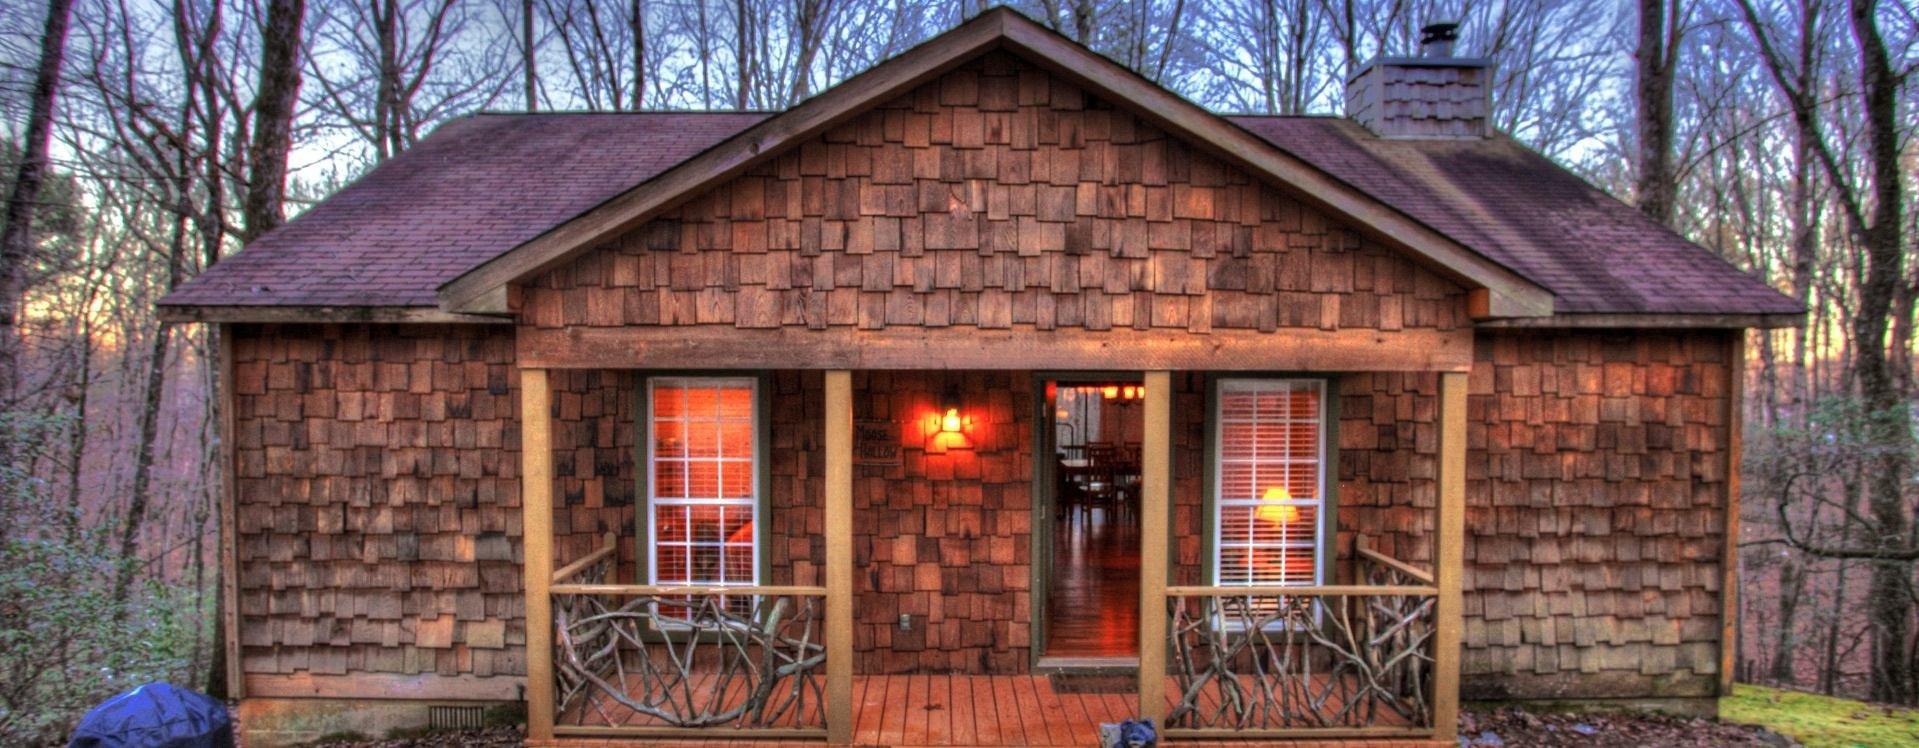 Moose-Hollow-Cedar-Creek-Cabin-Rentals-Helen-Georgia-top-banner